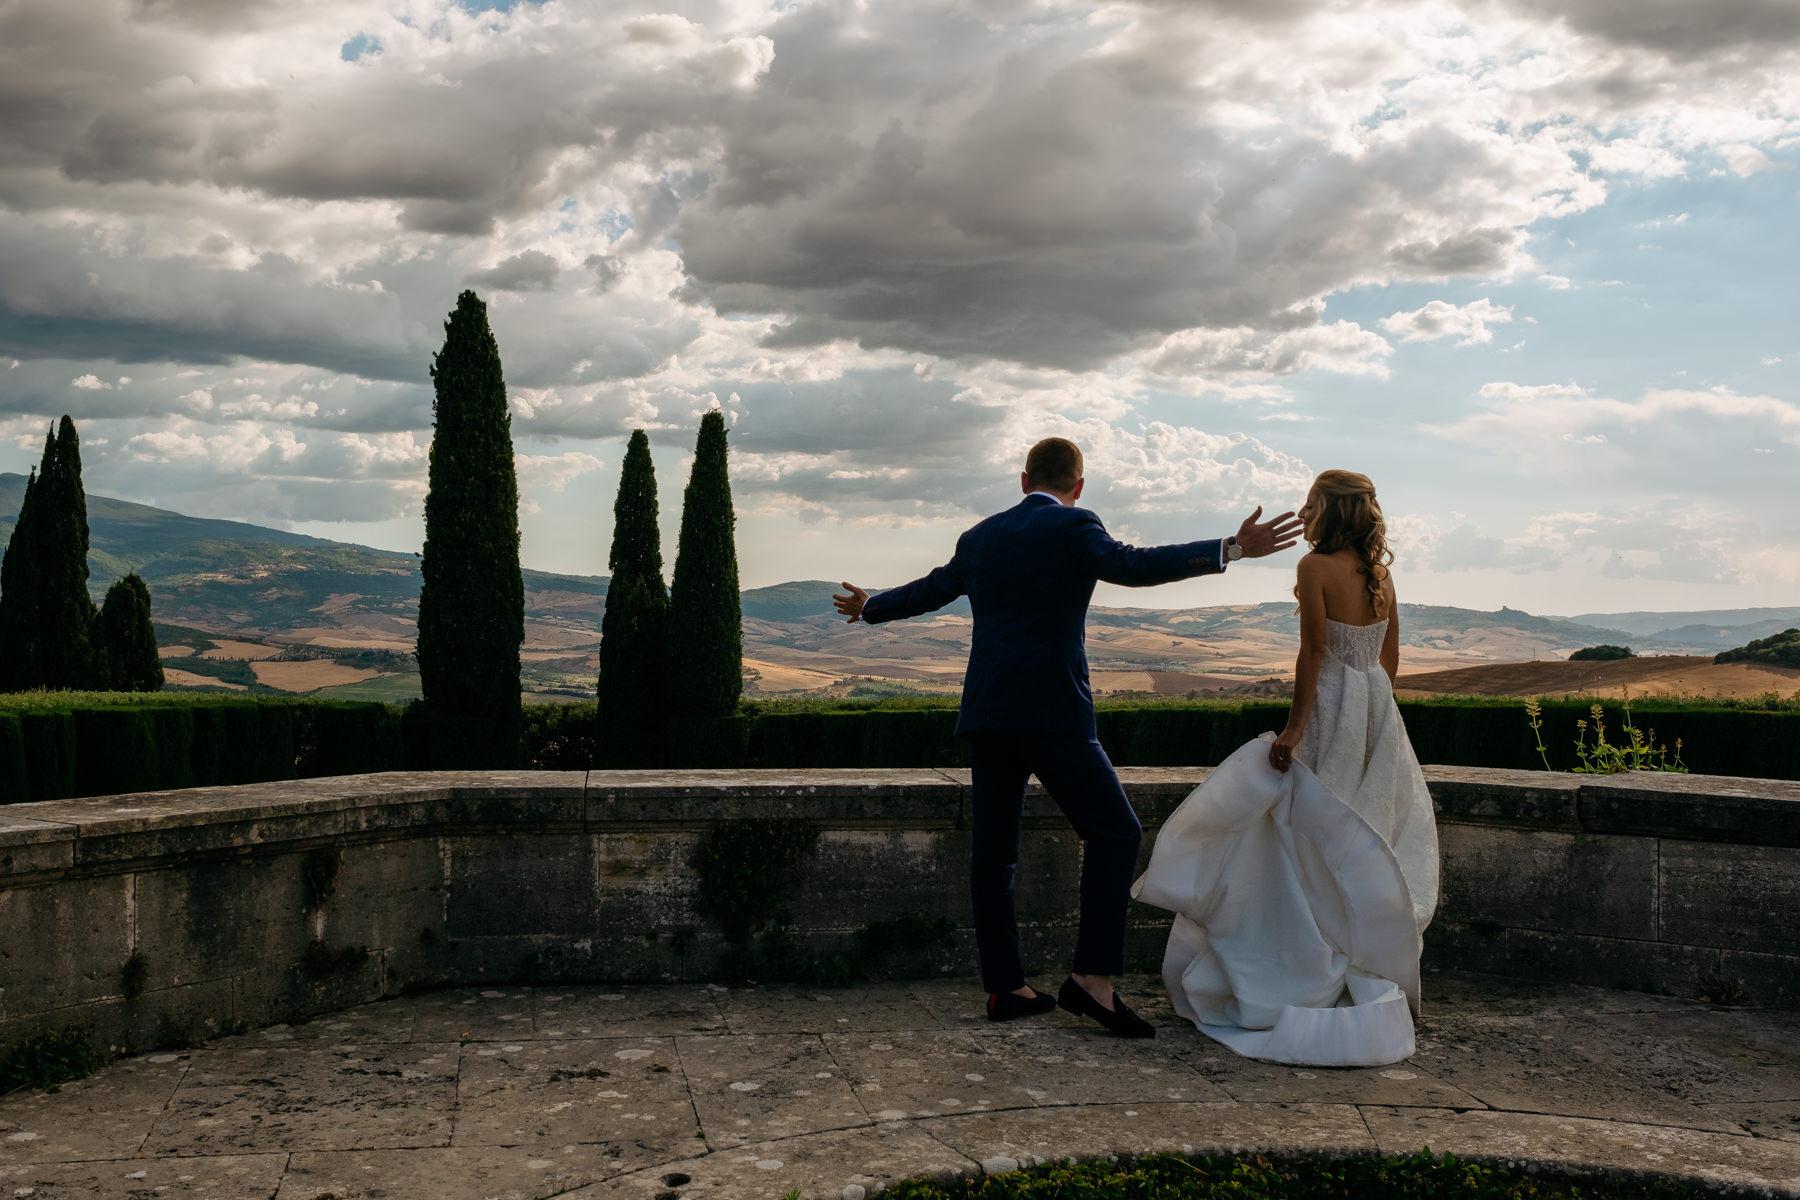 La Foce wedding in Tuscany Villa